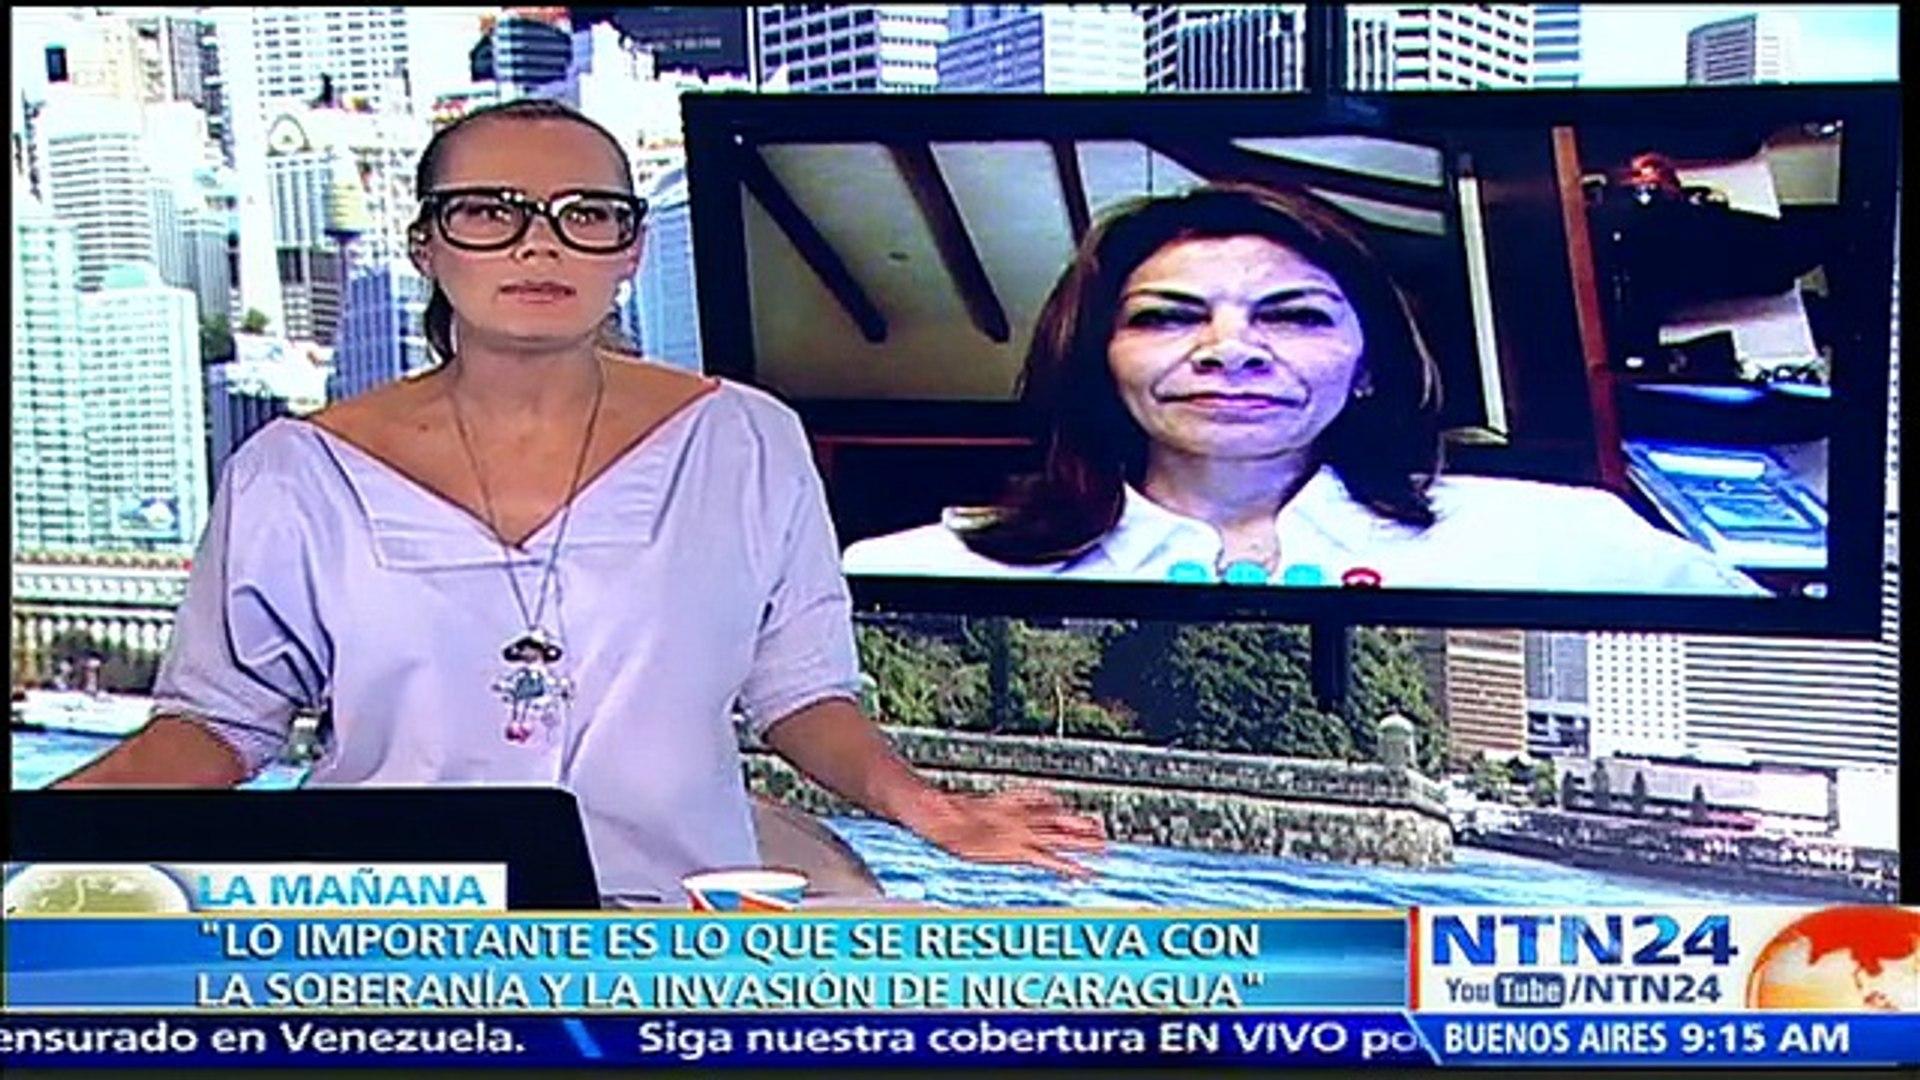 """Estoy esperanzada de que sea un triunfo sonoro para Costa Rica"": expresidenta Chinchilla sobre sent"